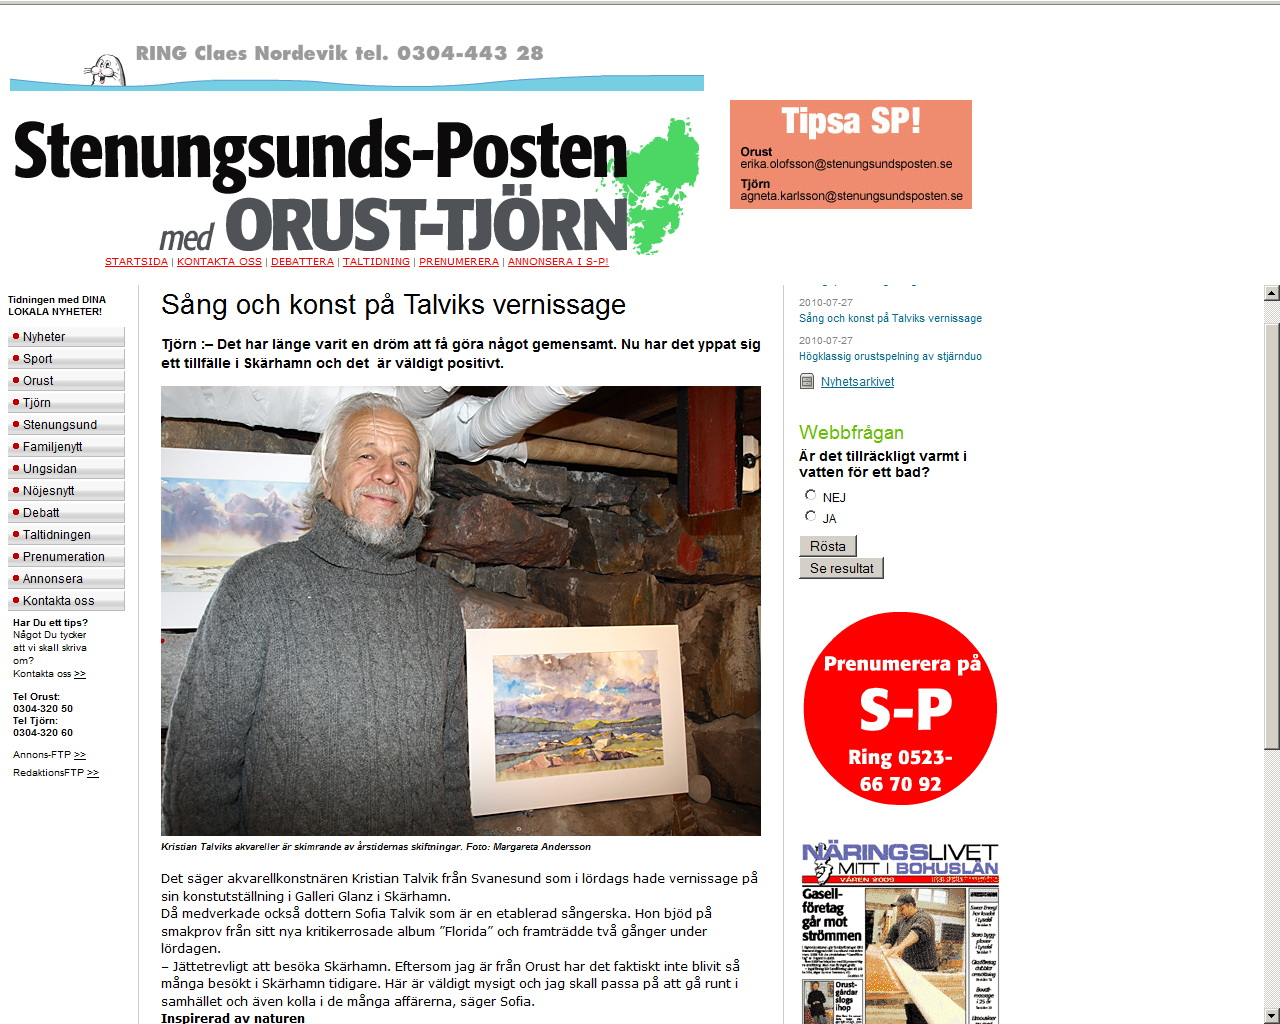 Kristian Talvik blir intervjuad i Stenungsunds-posten